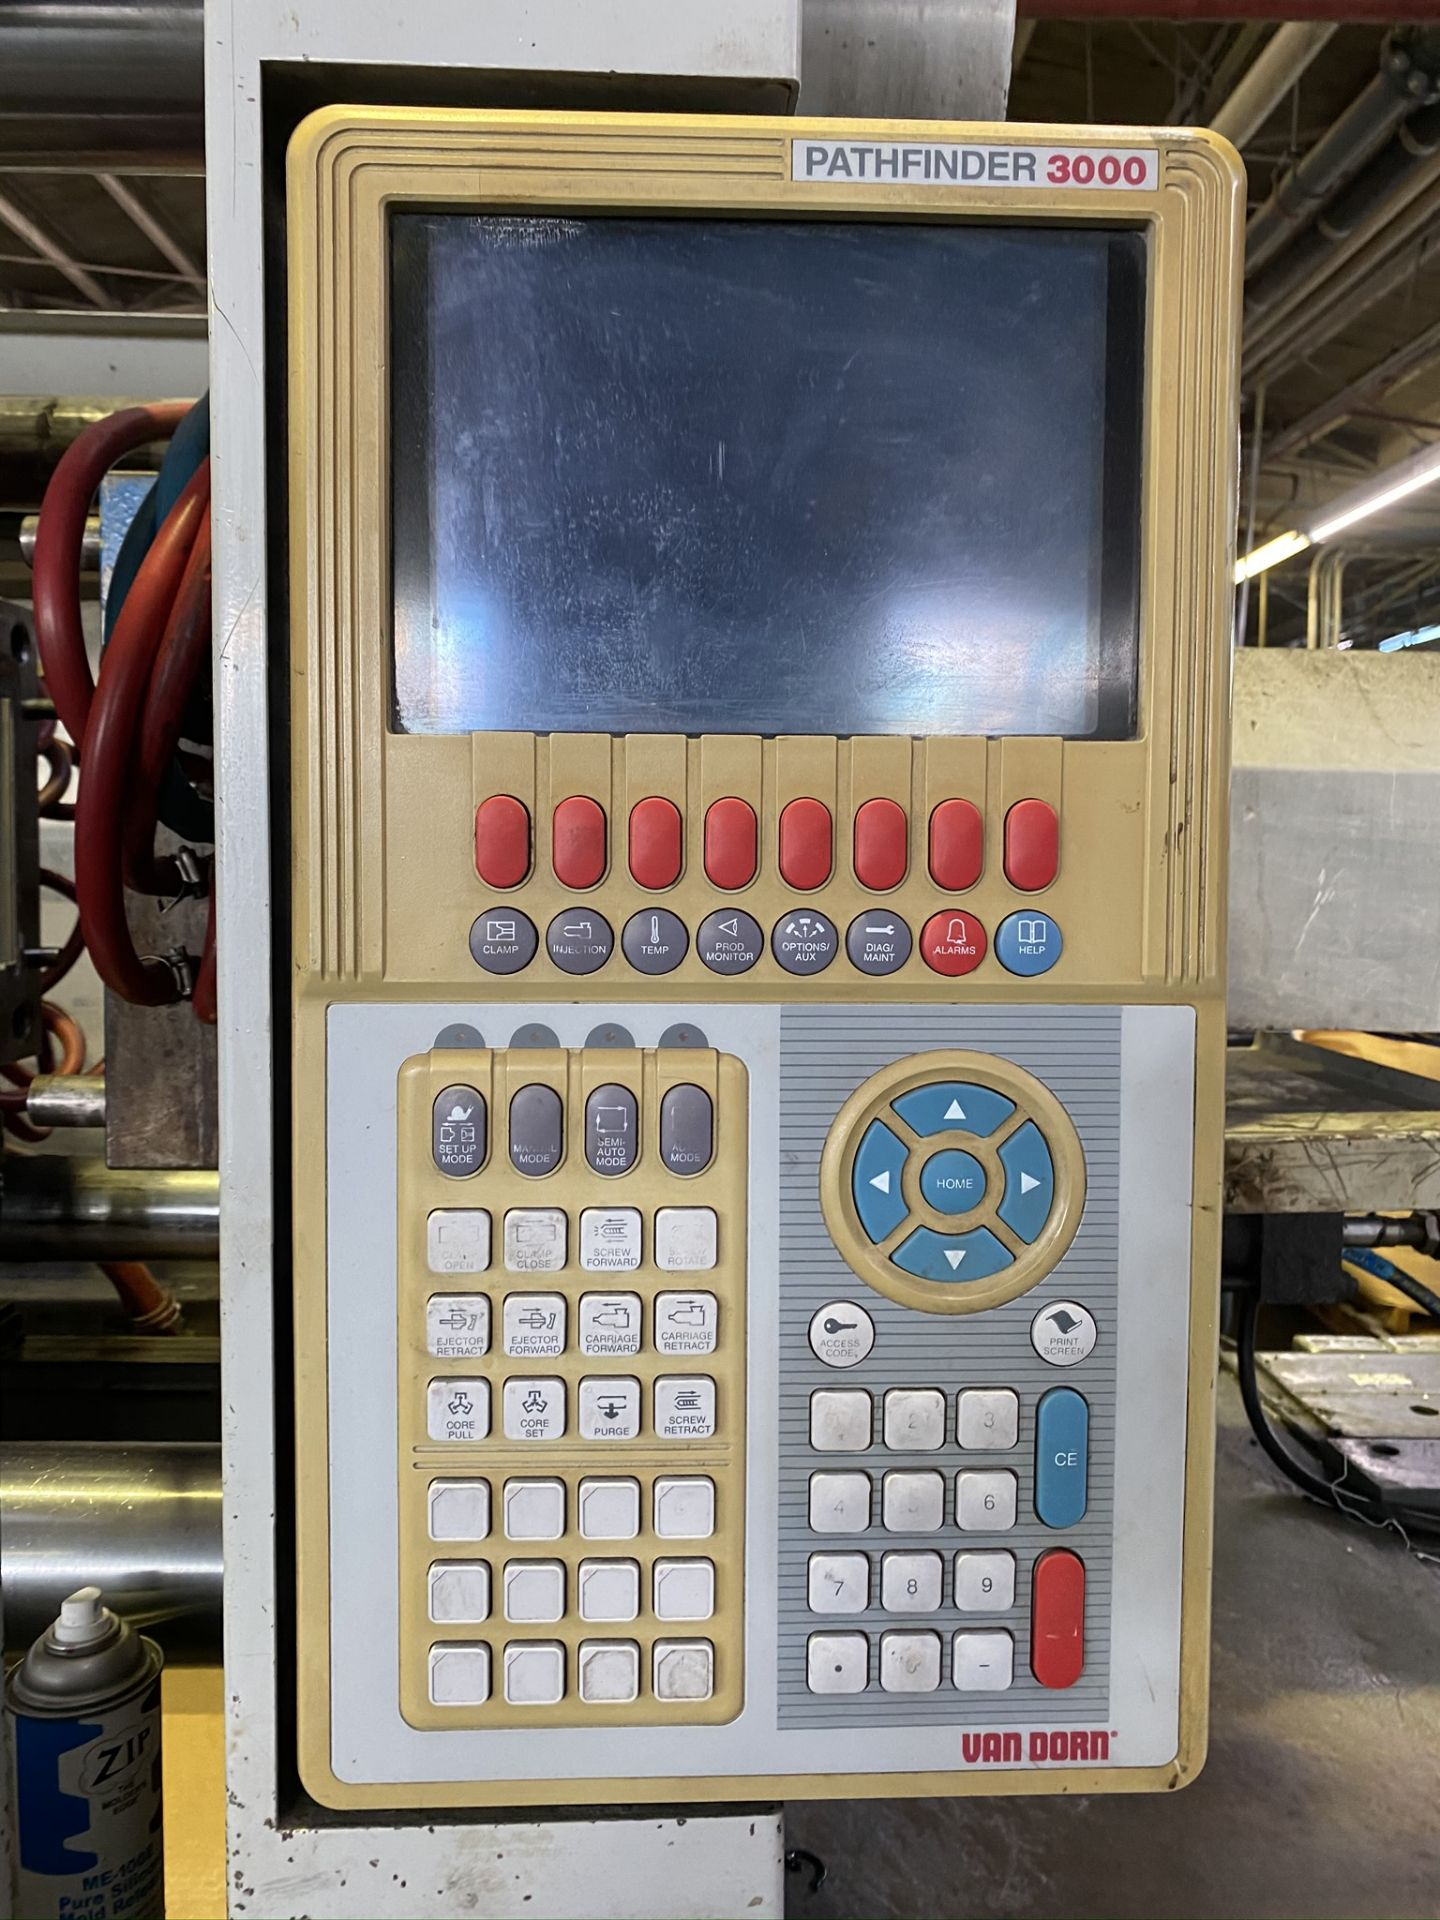 Lot 16 - 1999 VAN DORN 300 TON, MODEL 300HT1220-3149, PATHFINDER 3000 CONTROL, 25.4 OZ SHOT SIZE